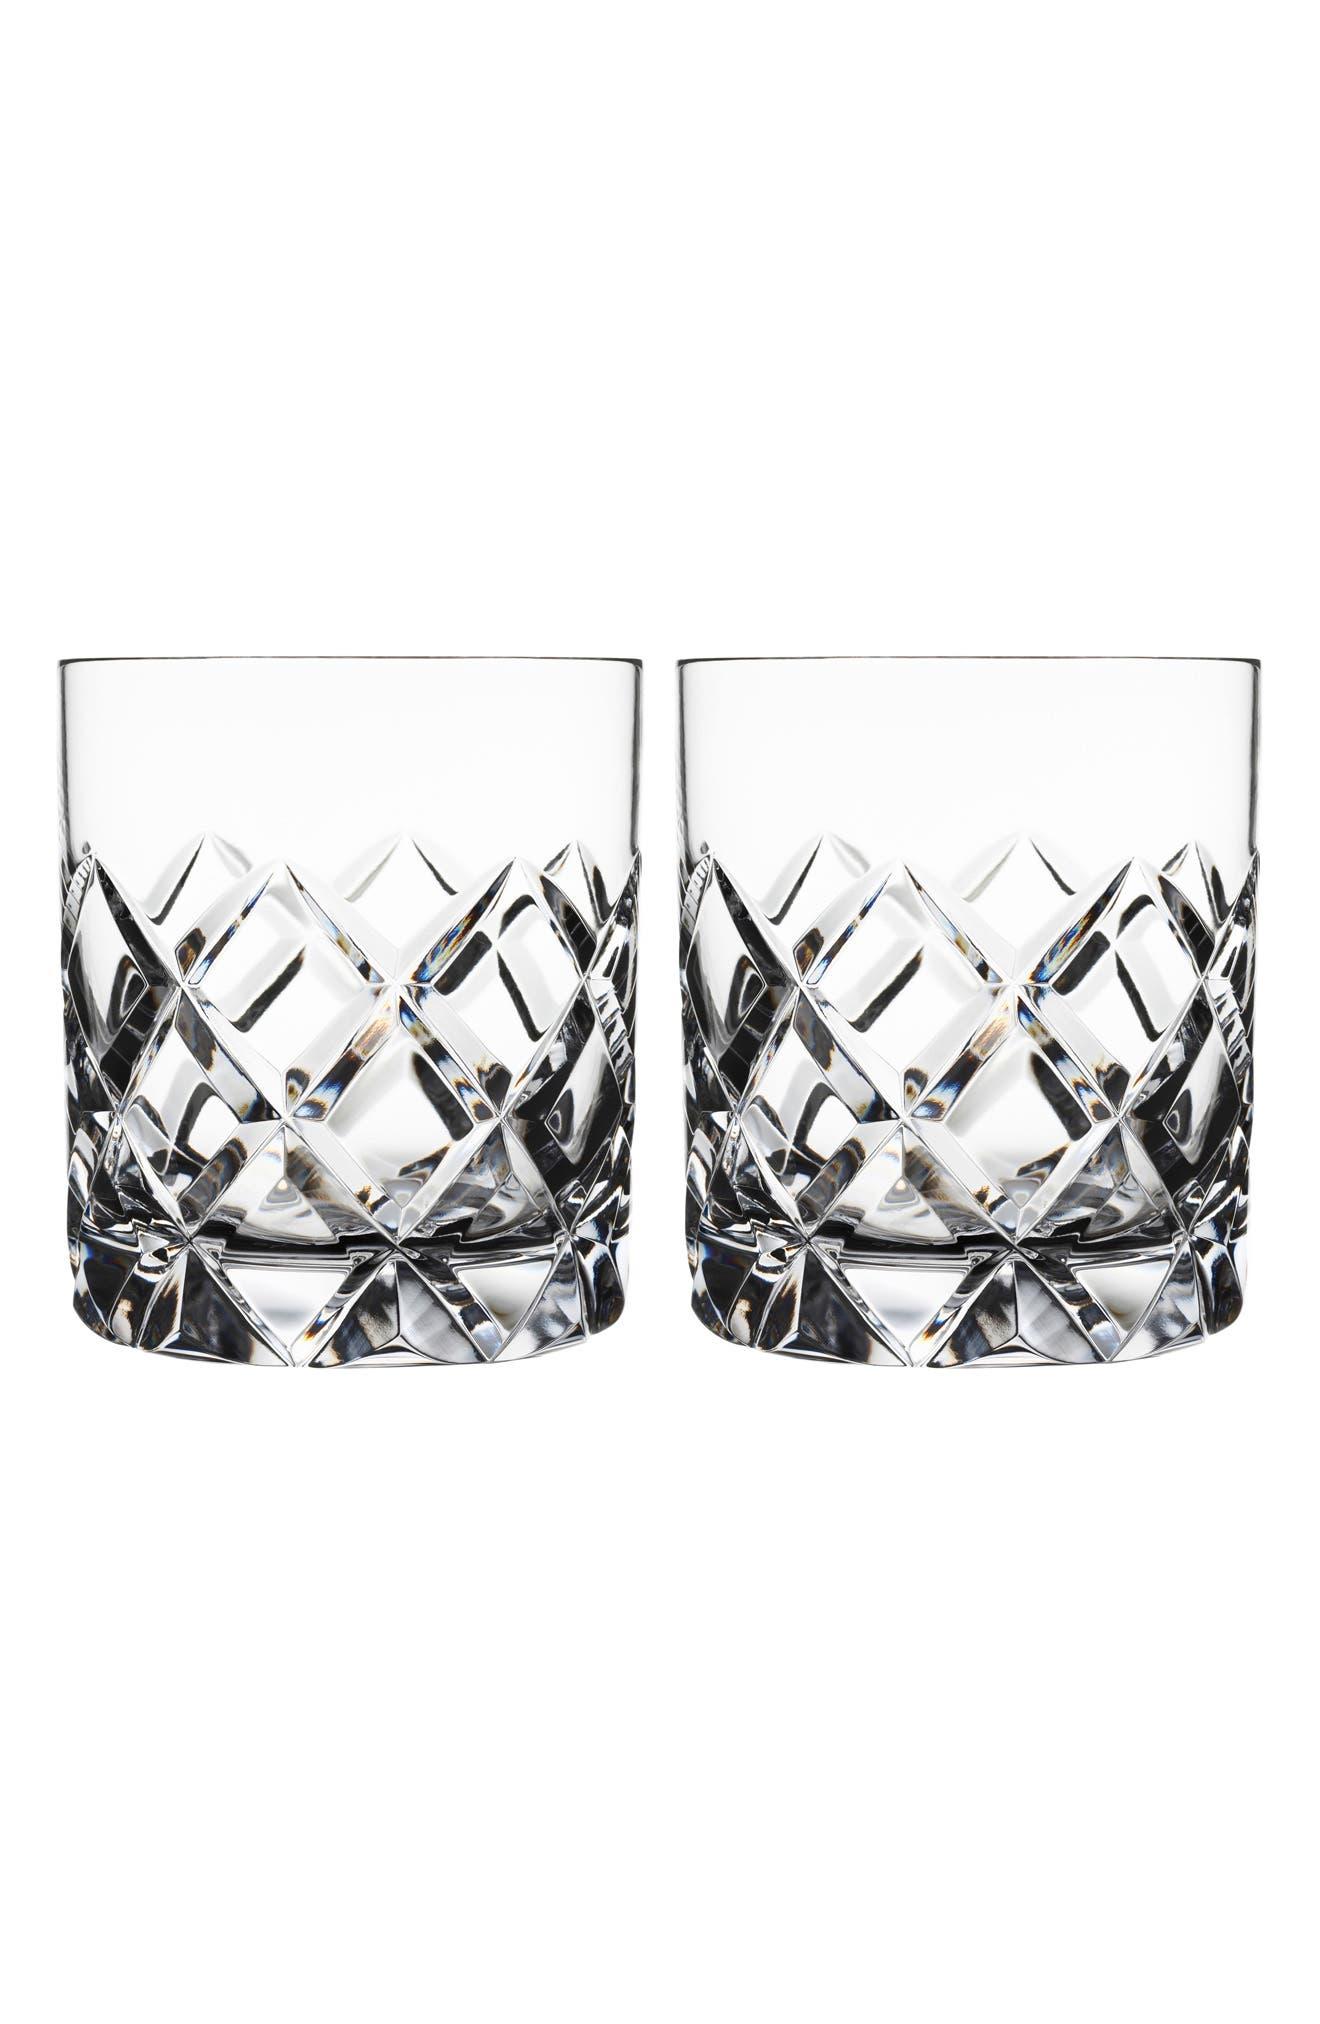 Main Image - Orrefors Sofiero Set of 2 Crystal Old Fashioned Glasses